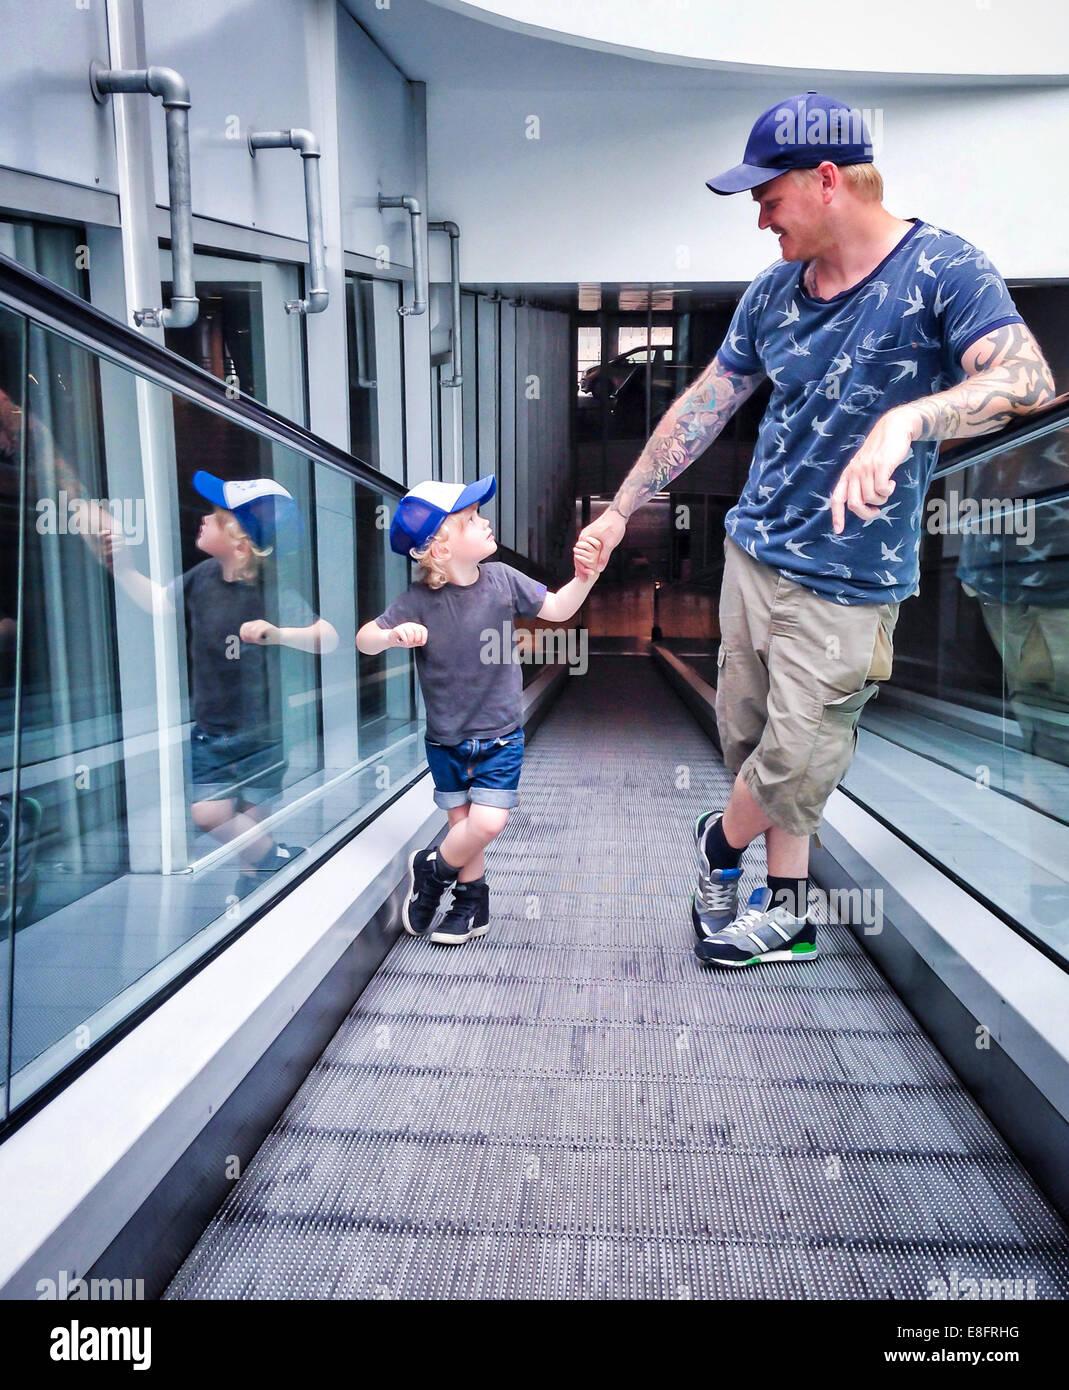 Padre e hijo de pie sobre una travelator Imagen De Stock